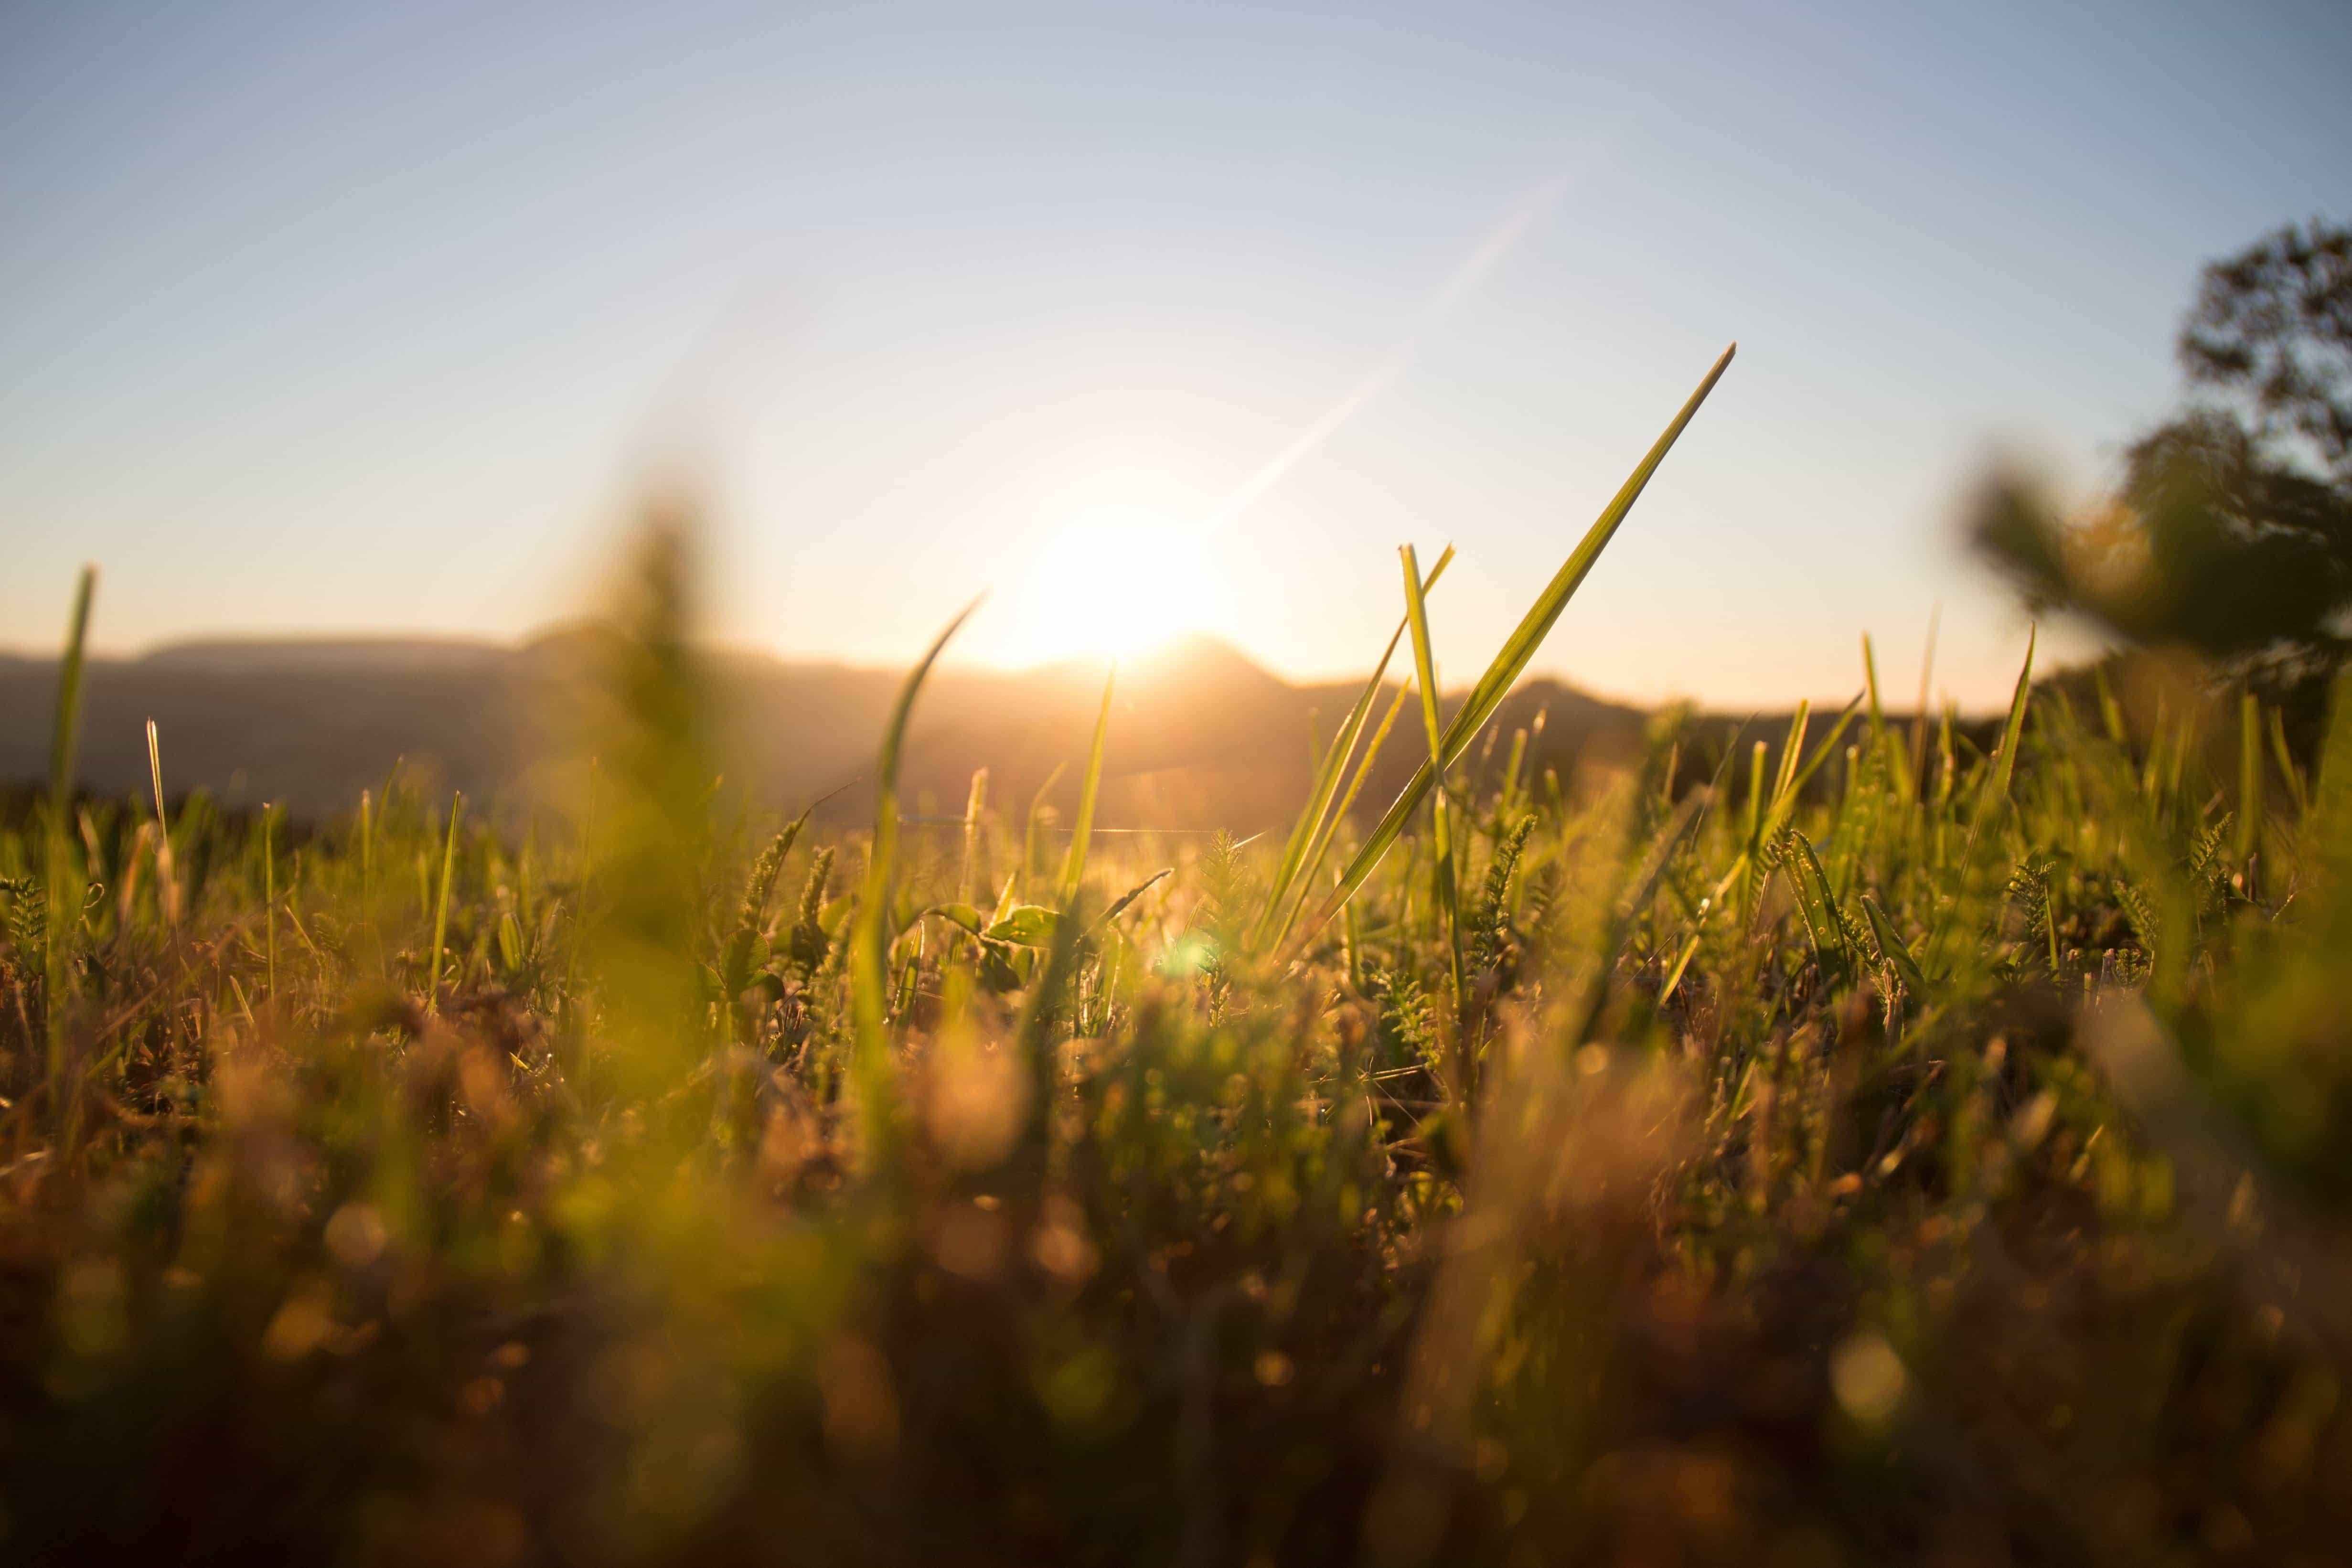 Free picture: field, grass, sunrise, herb, sun, nature ...